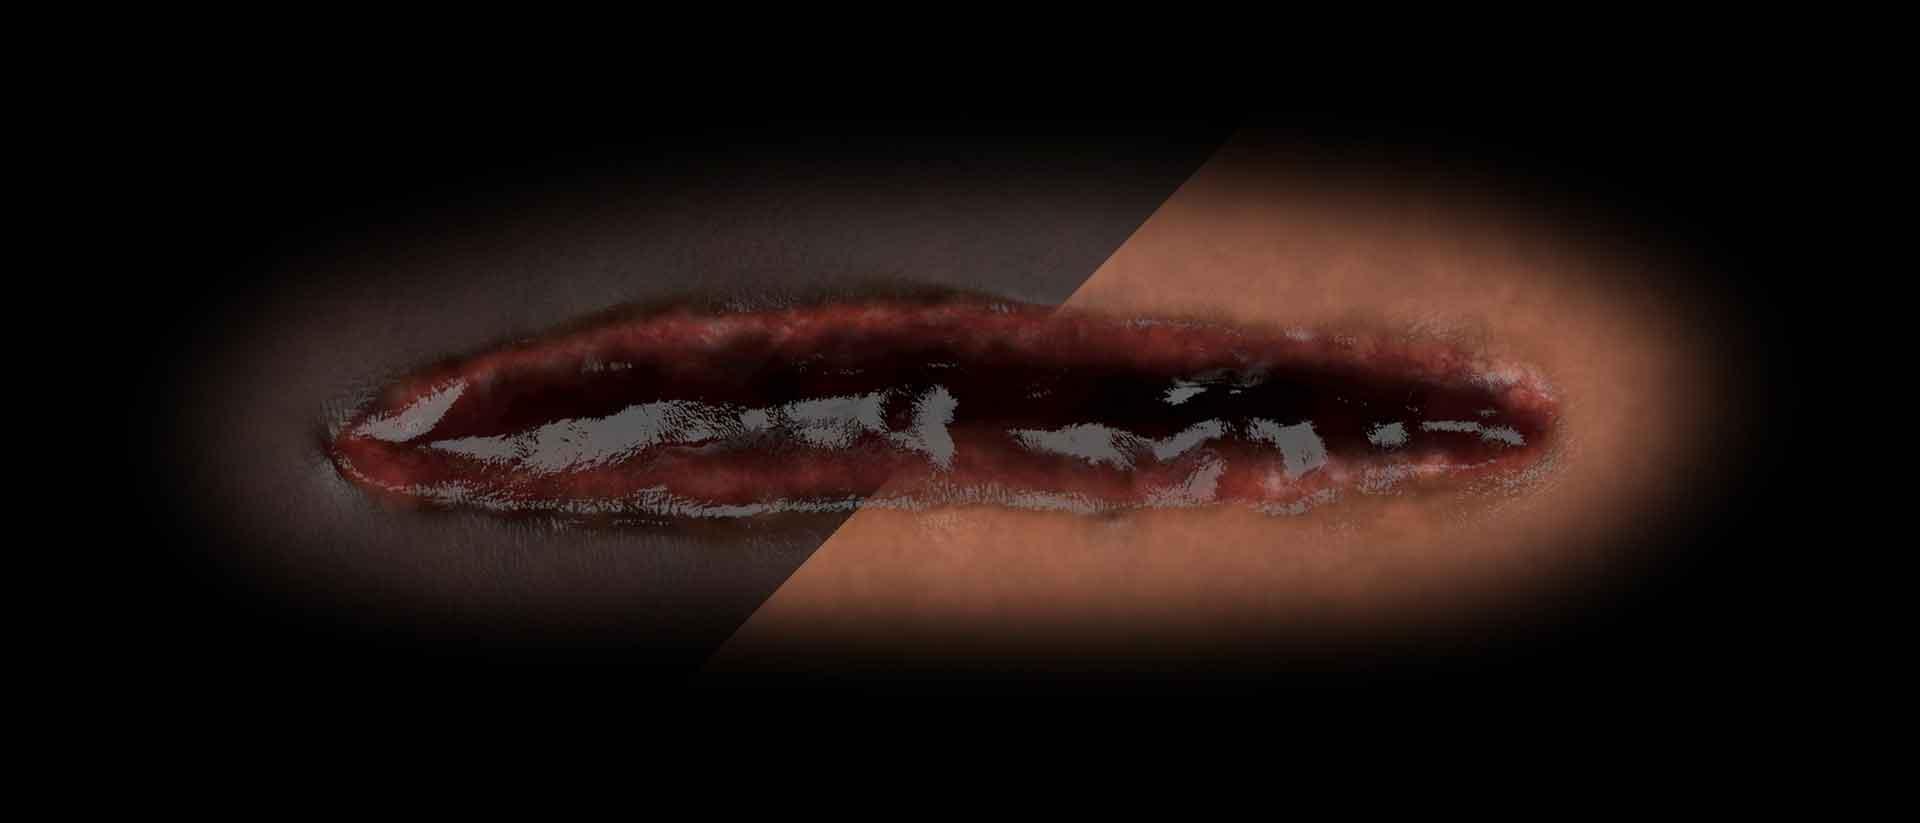 Gore textures skin tone blog banner